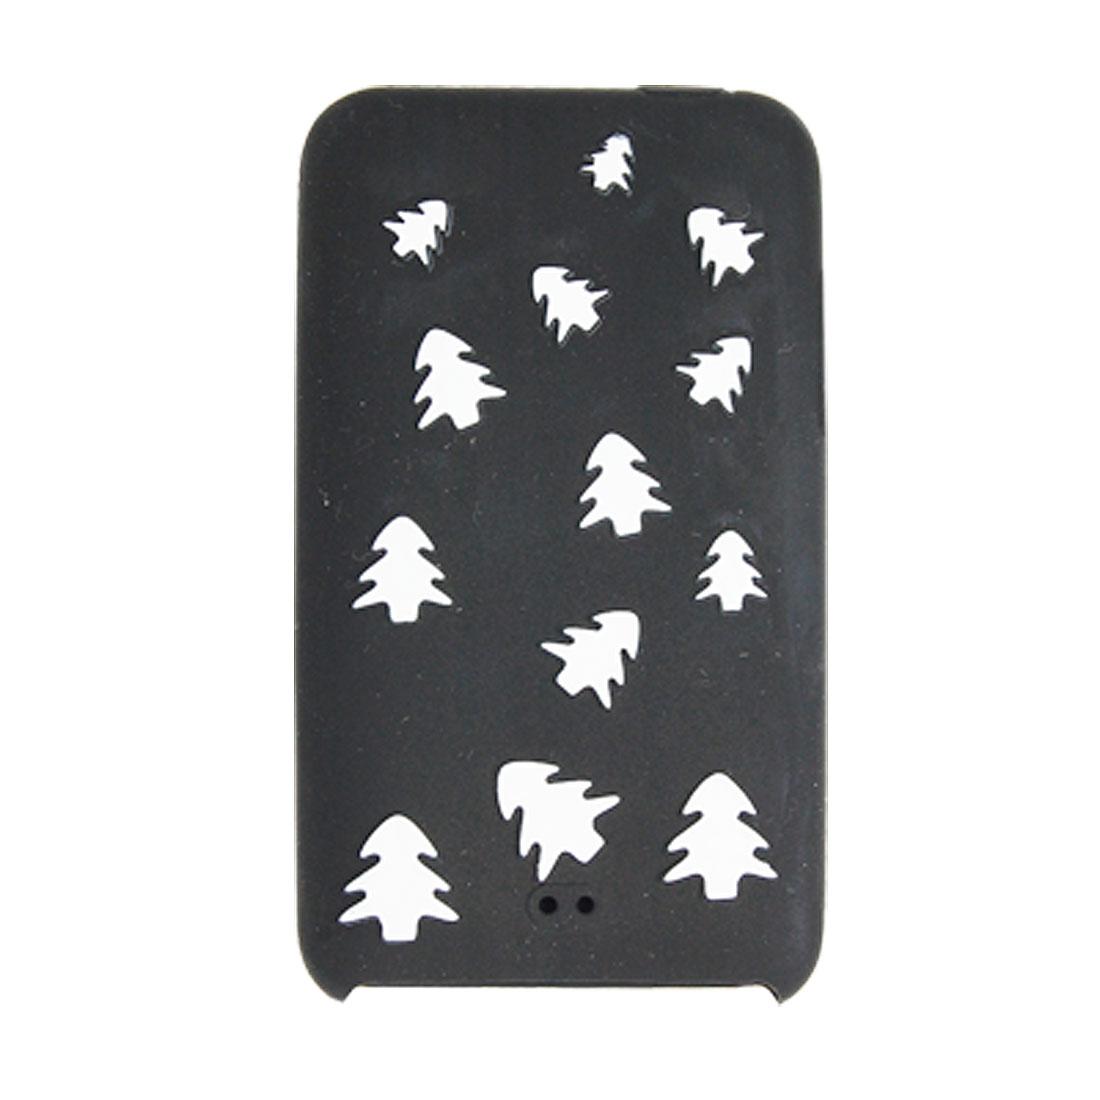 Unique Bargains Black Silicone Skin Case w White Tree for iPod Touch 2